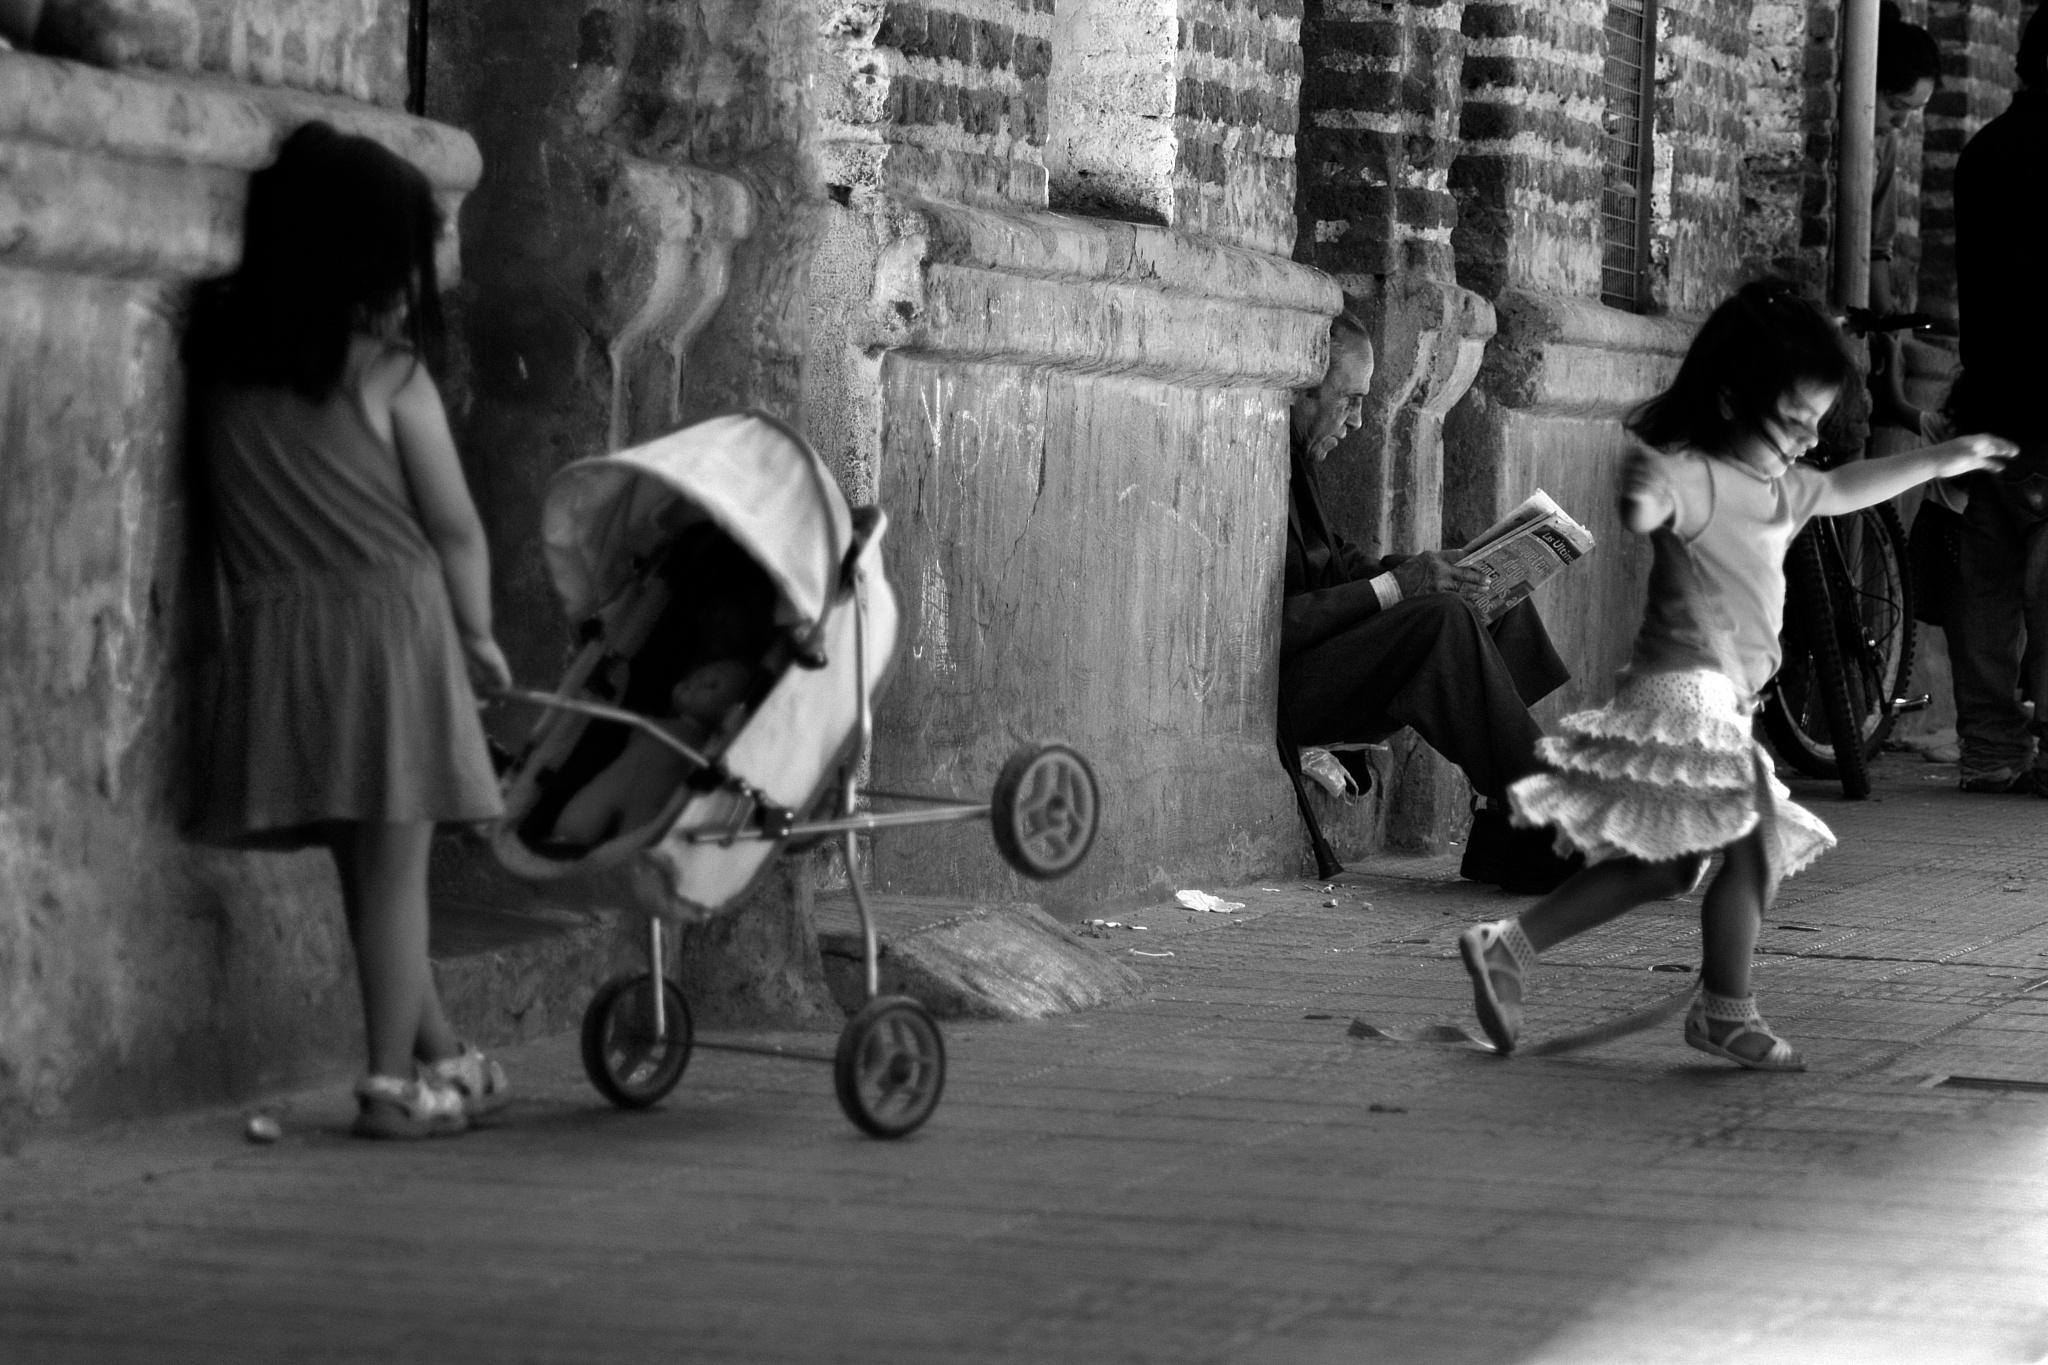 Vida de Barrio by Paula Navarro